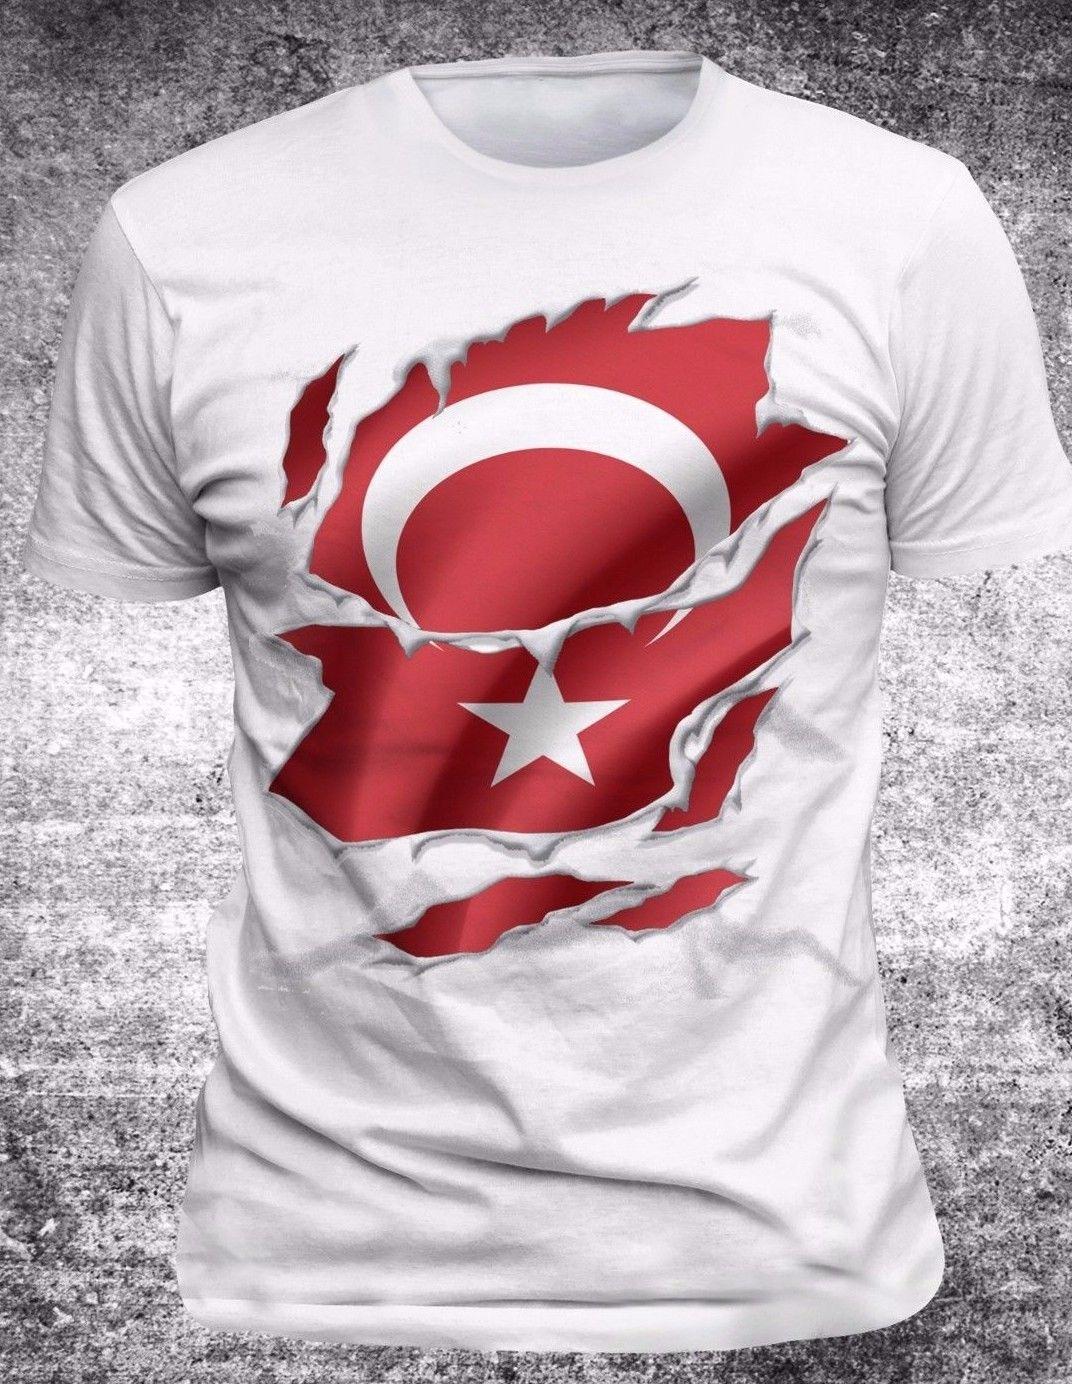 Hot Sale Mens CottonT-Shirt Turkiye Footballer Fans ,Istanbul,Turkey,Turkei Summer Style Tee Hip Hop Shirt Harajuku Streetwear